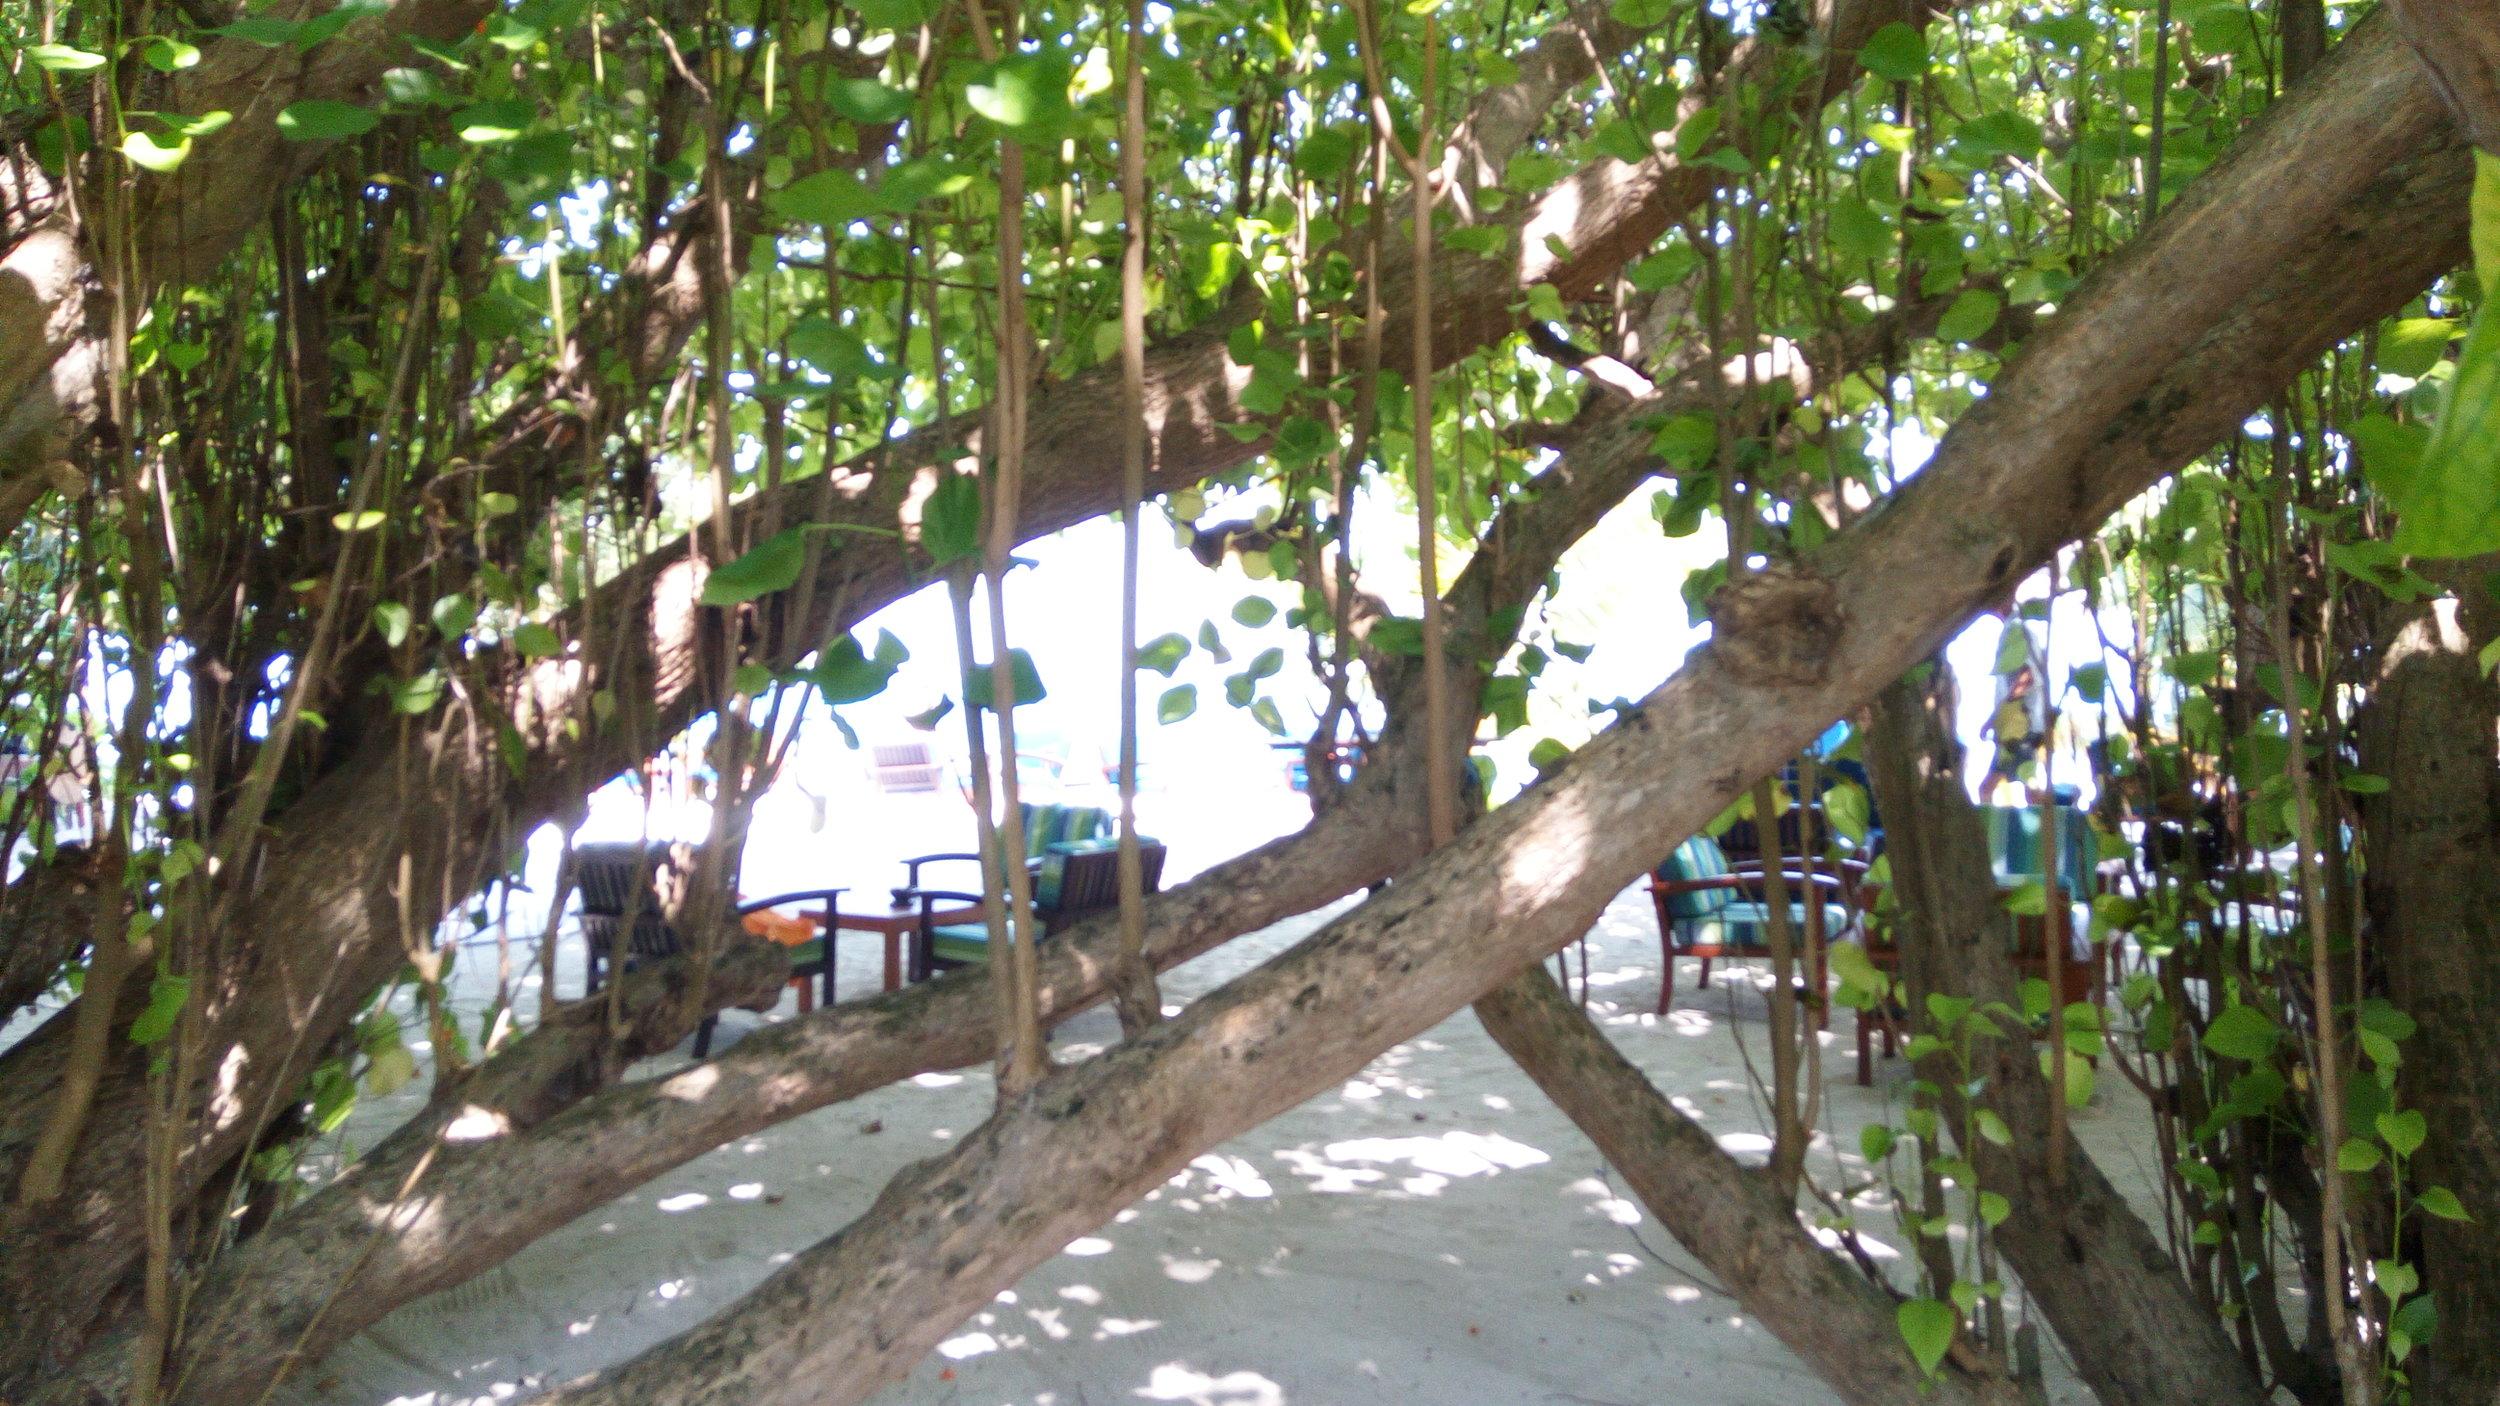 Bar Cum seating area on the beach